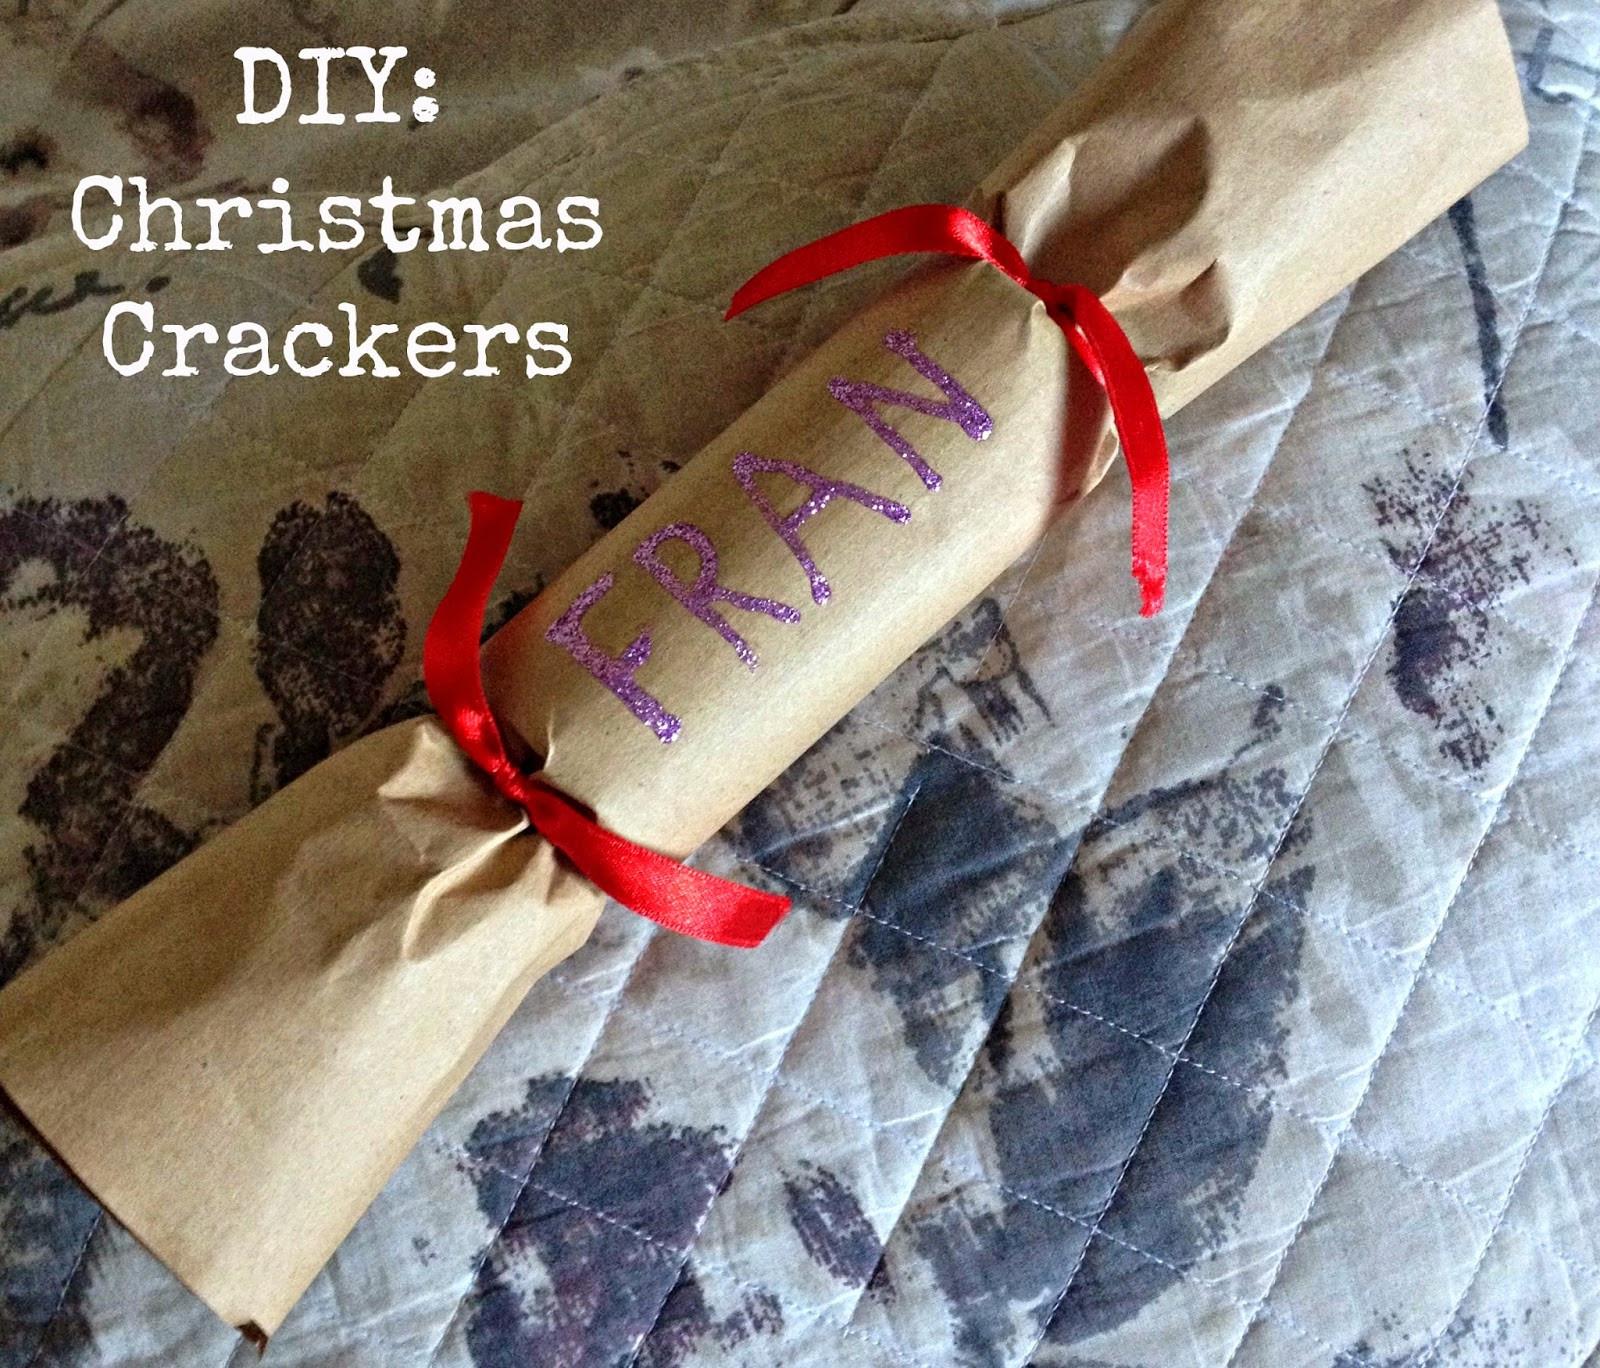 Diy Christmas Crackers  Emily & Han xo DIY Christmas Crackers